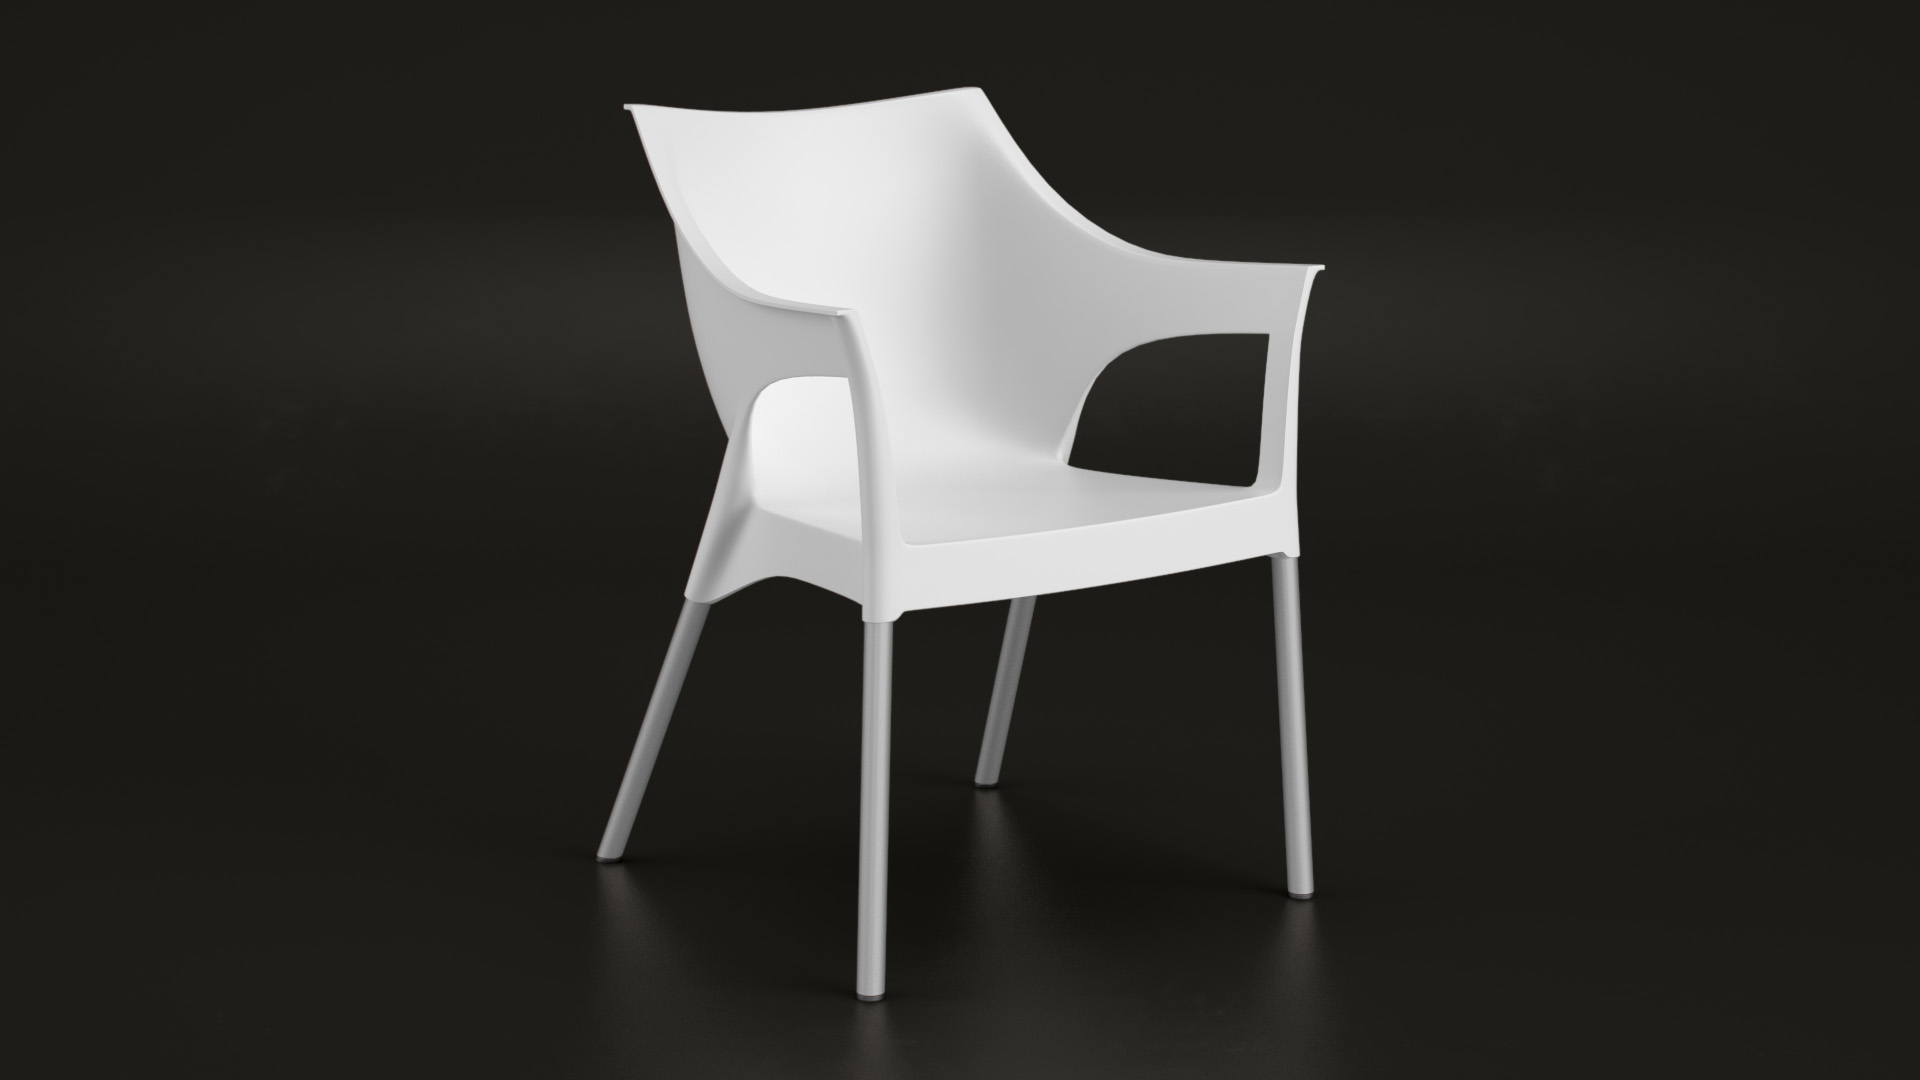 Pole_Chair_BlackSet_01_V1.01_0000